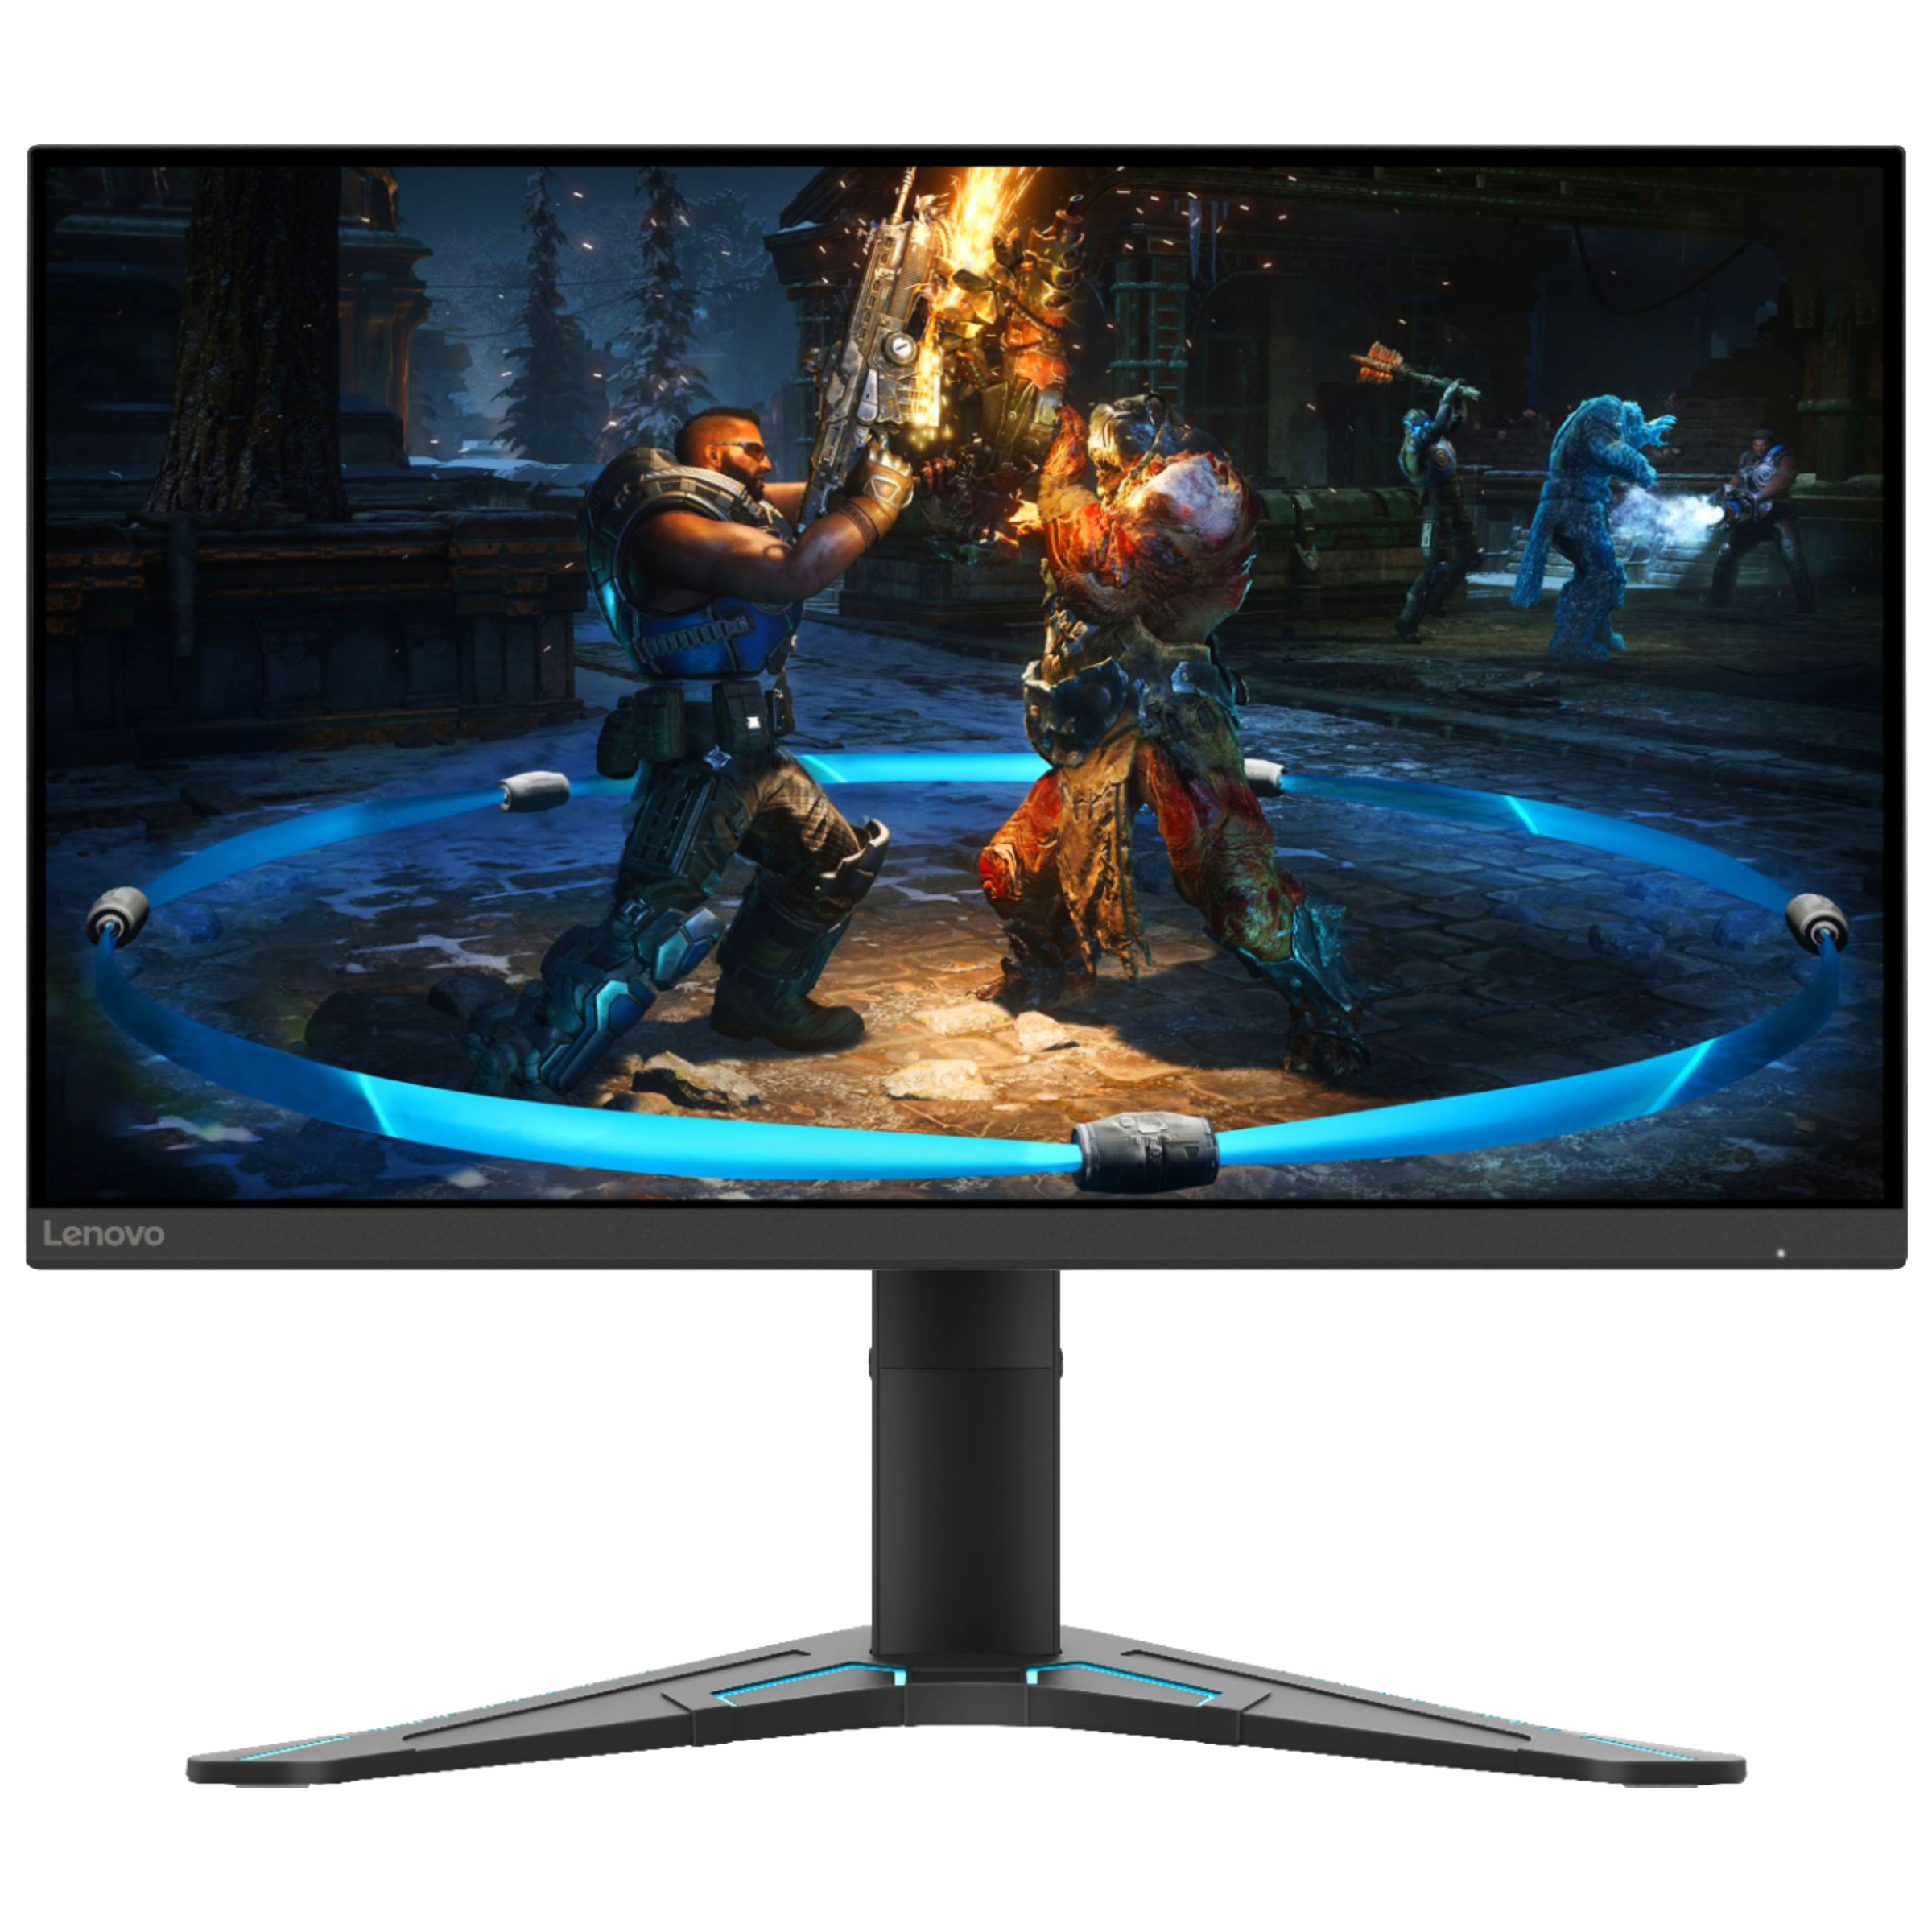 Lenovo G27-20 68.5cm (27 Inches) Full HD IPS Screen Gaming Monitor (AMD FreeSync Premium Technology, HDMI + DisplayPort + Aux, 144 Hz, 66C2GAC1IN, Black)_1